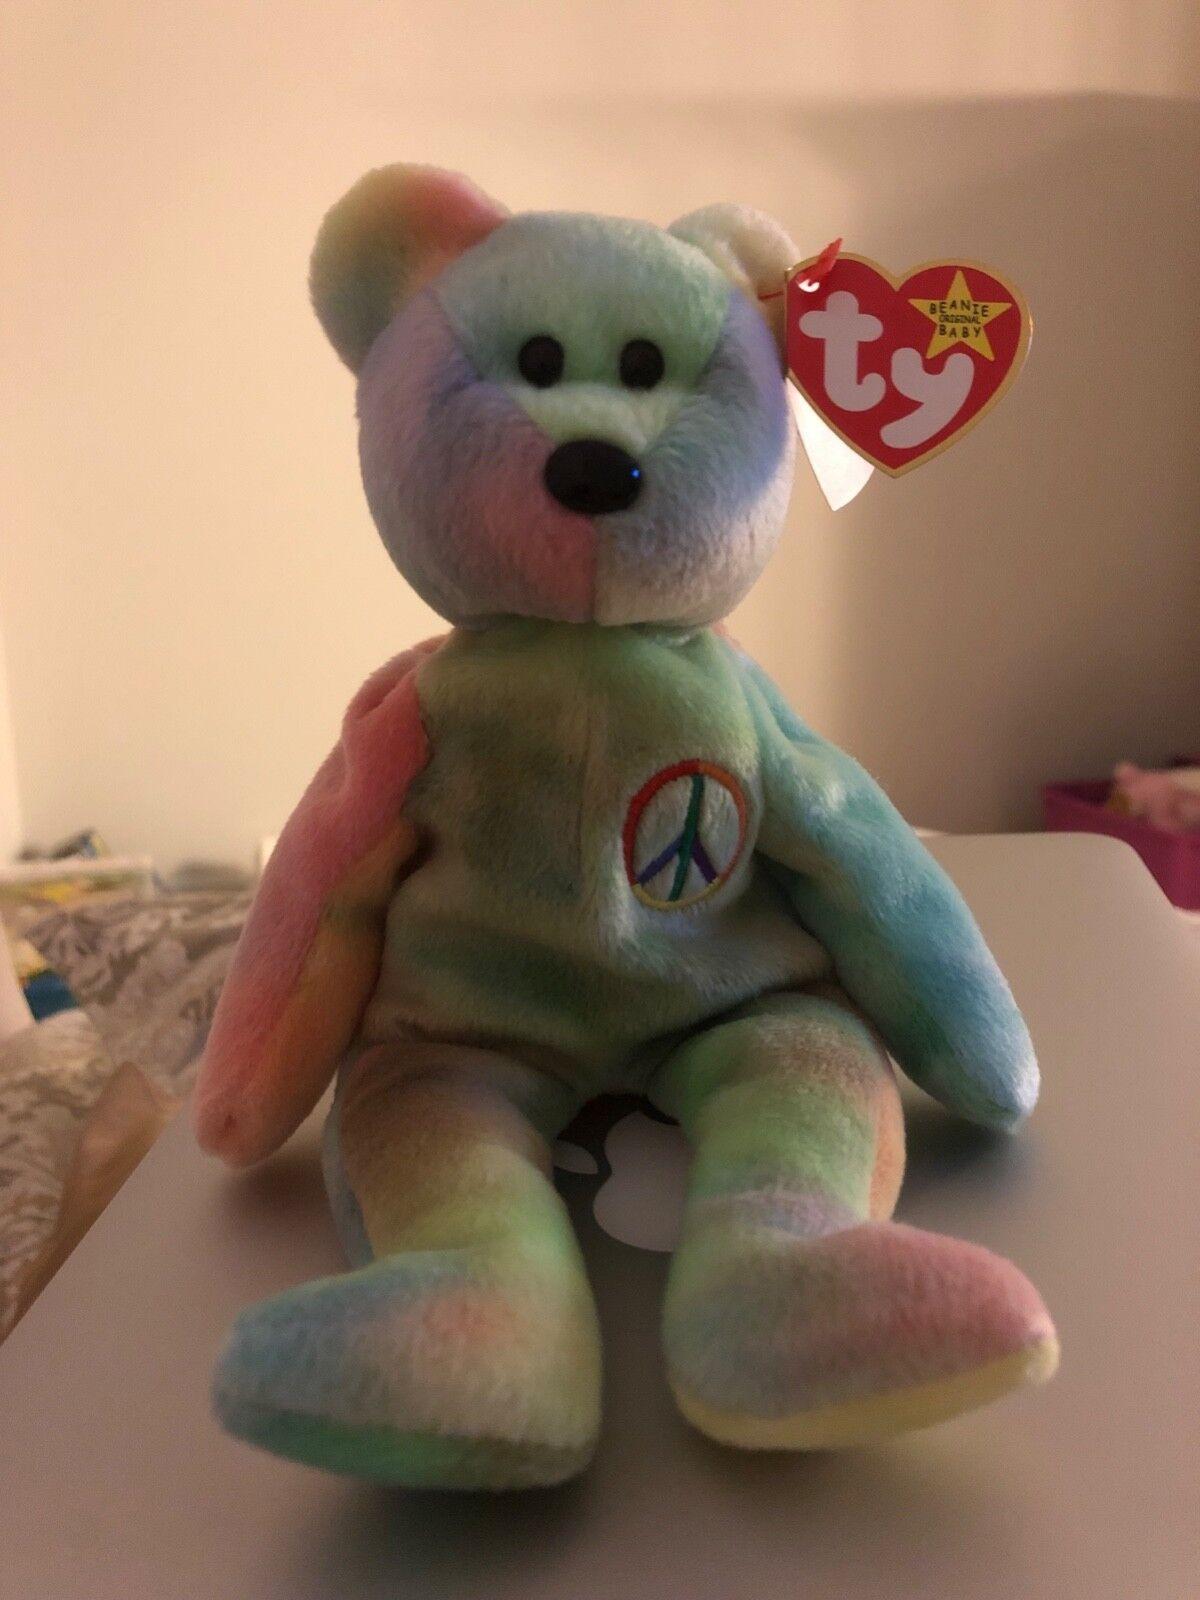 TY Beanie Baby PEACE the BEAR 1996 ERROR ERROR ERROR BEAR - Mint condition. ec5f5b